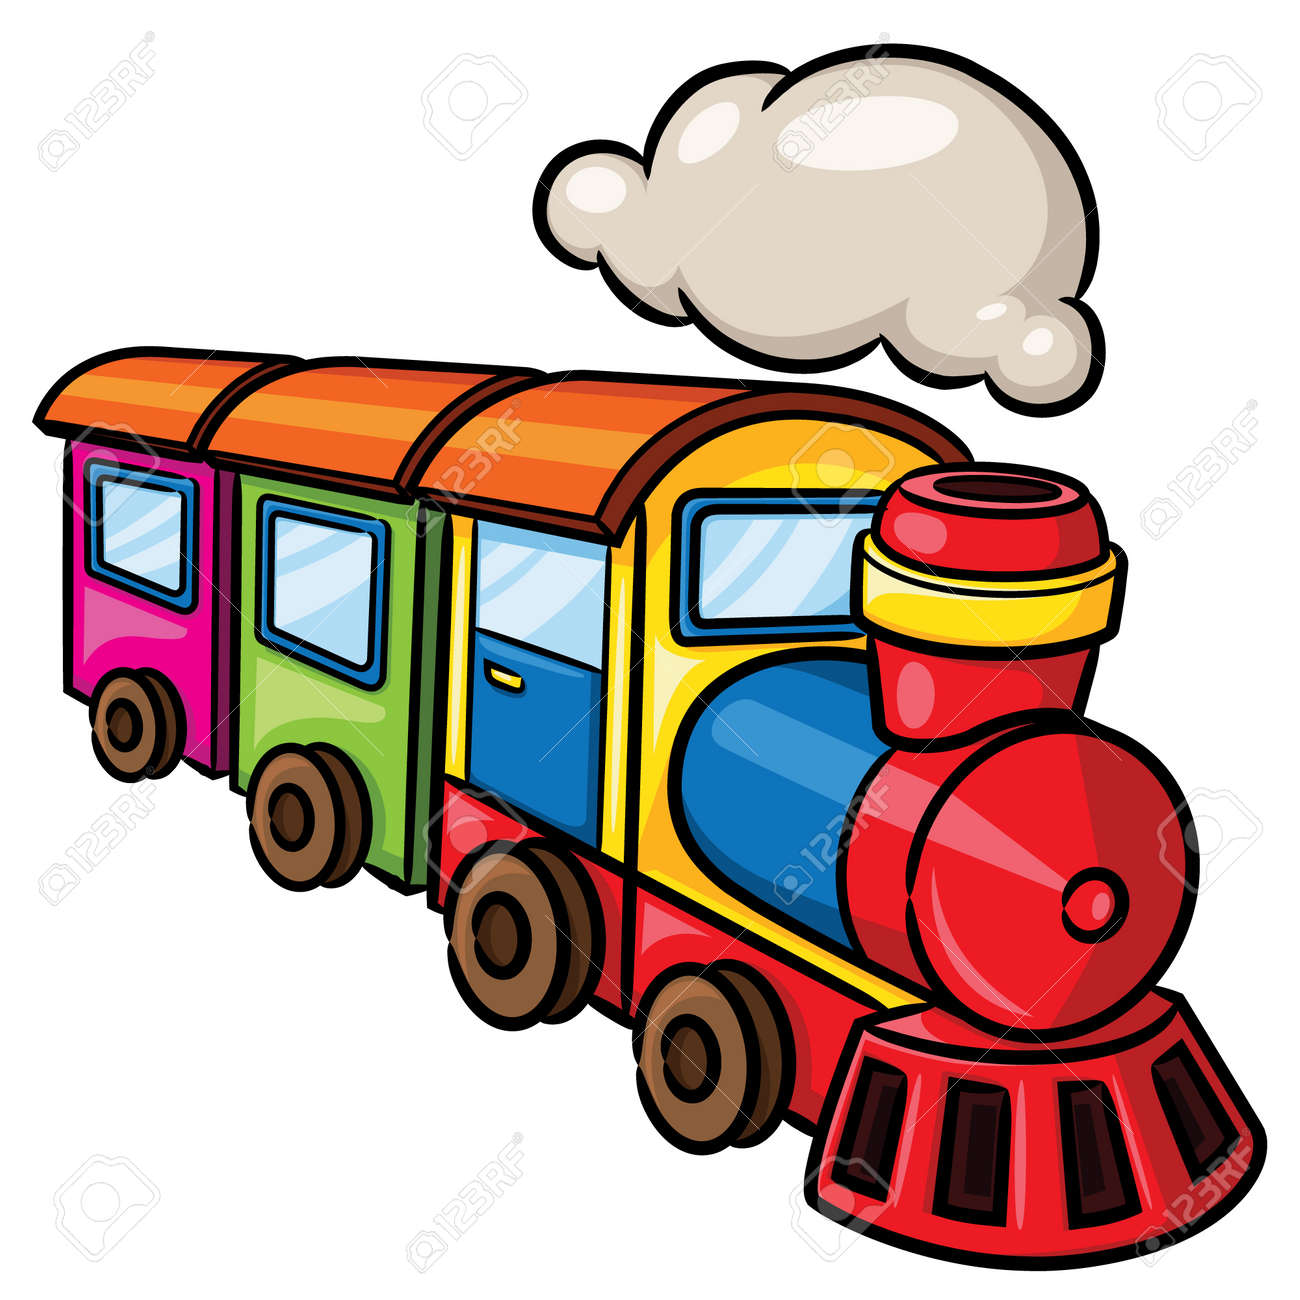 illustration of cute cartoon train royalty free cliparts vectors